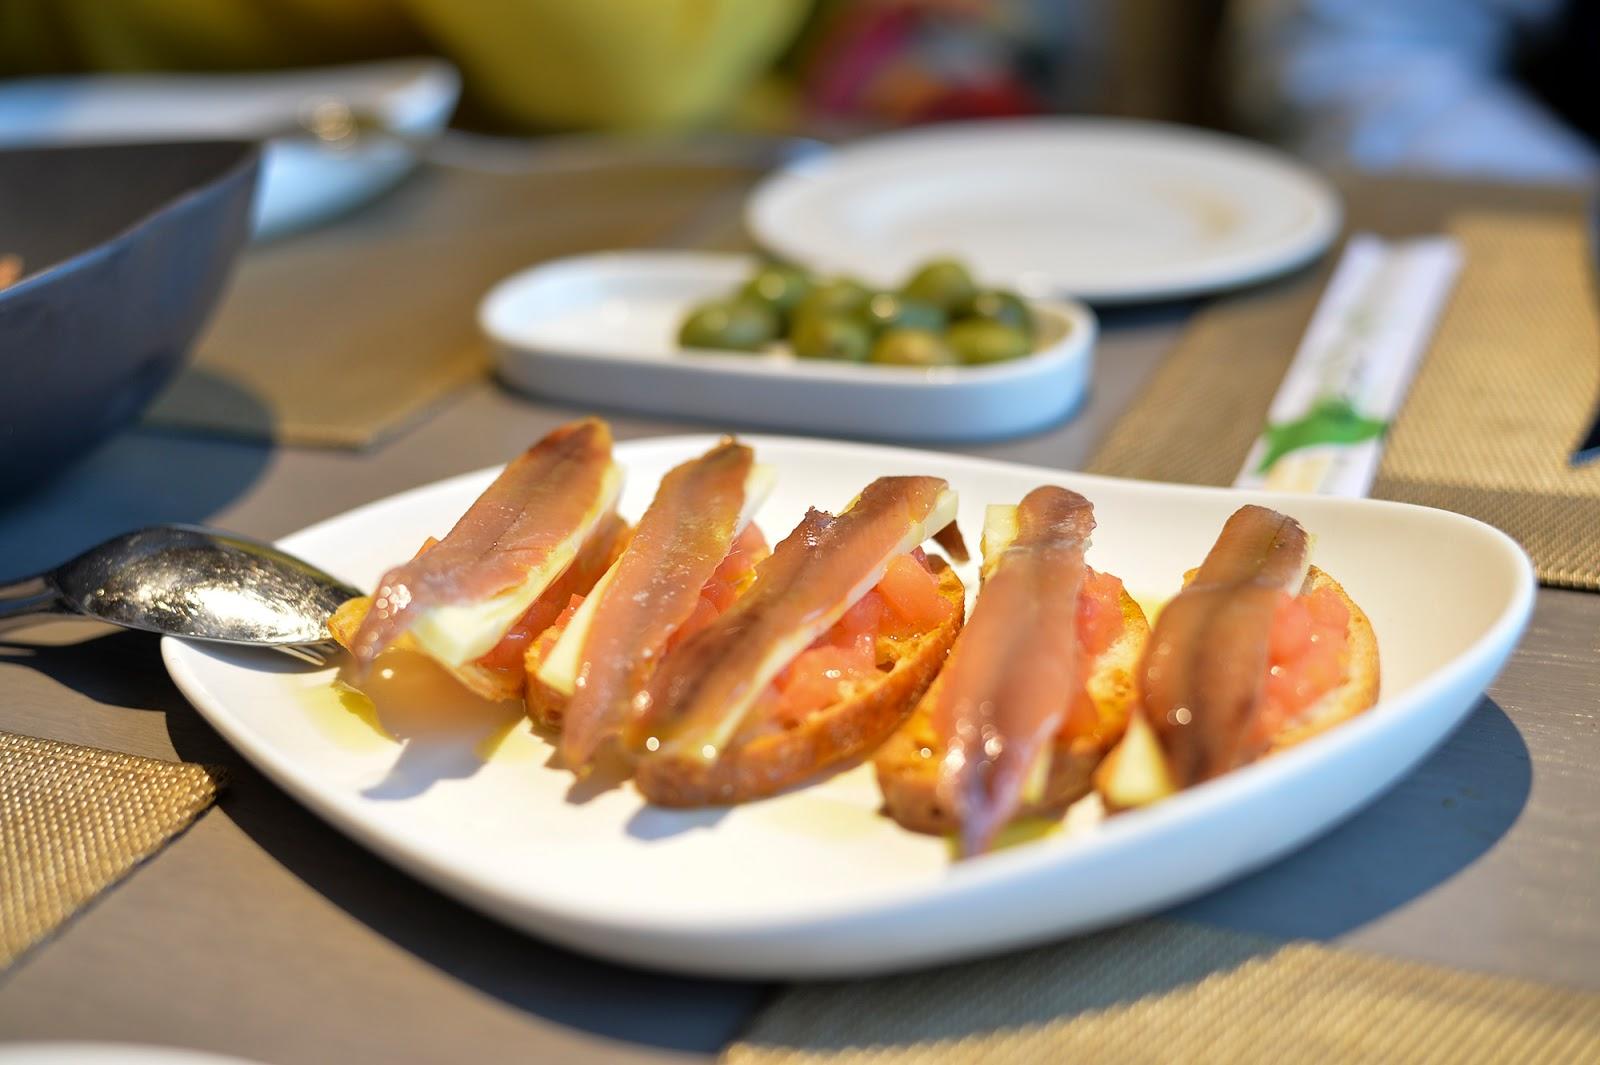 nimu azotea rooftop restaurant leon menu anchoas anchovies starters picoteo